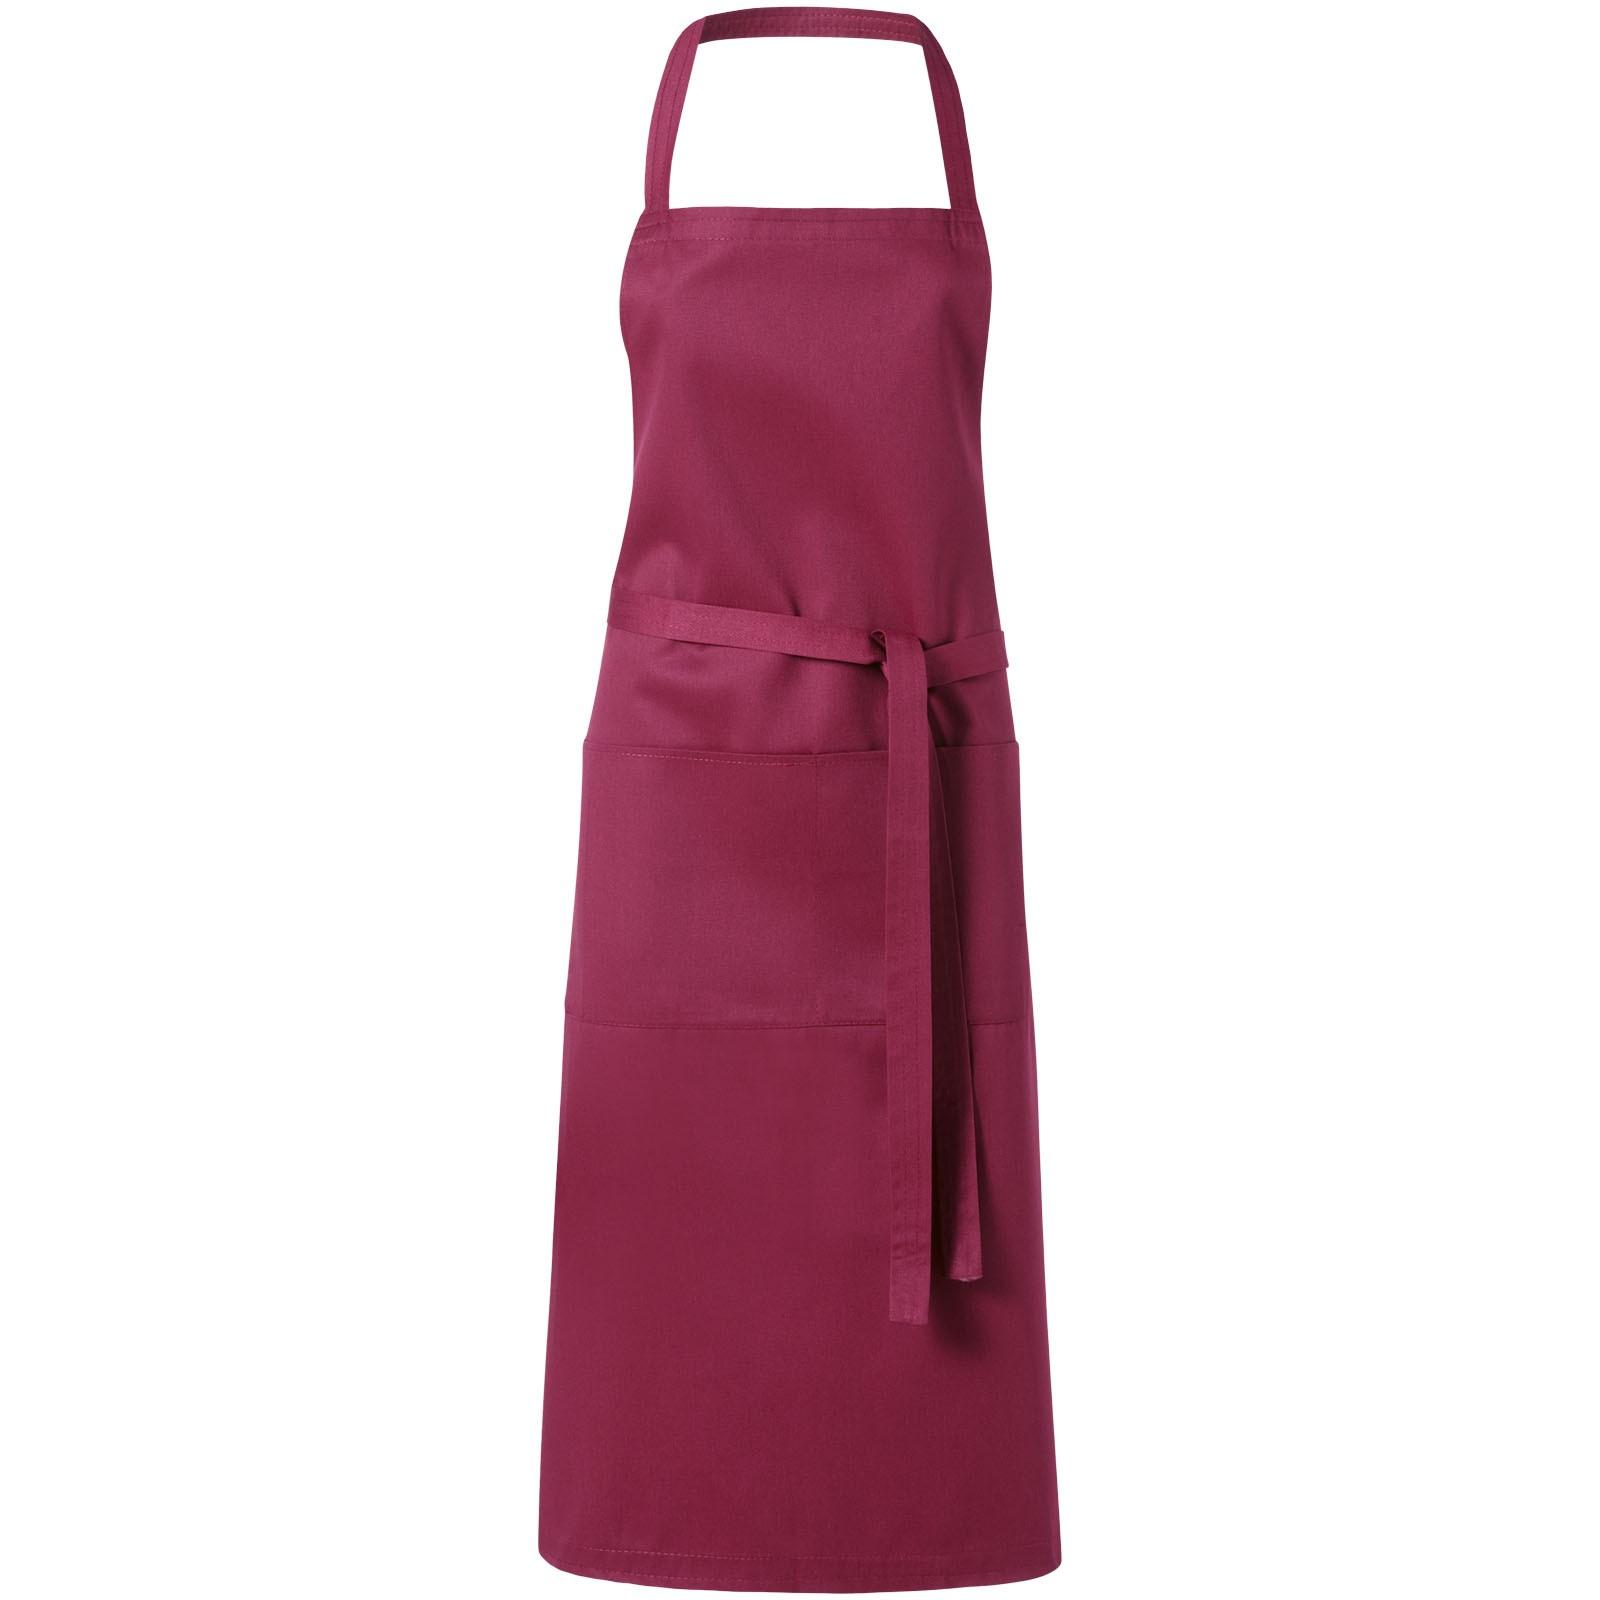 Viera apron with 2 pockets - Burgundy